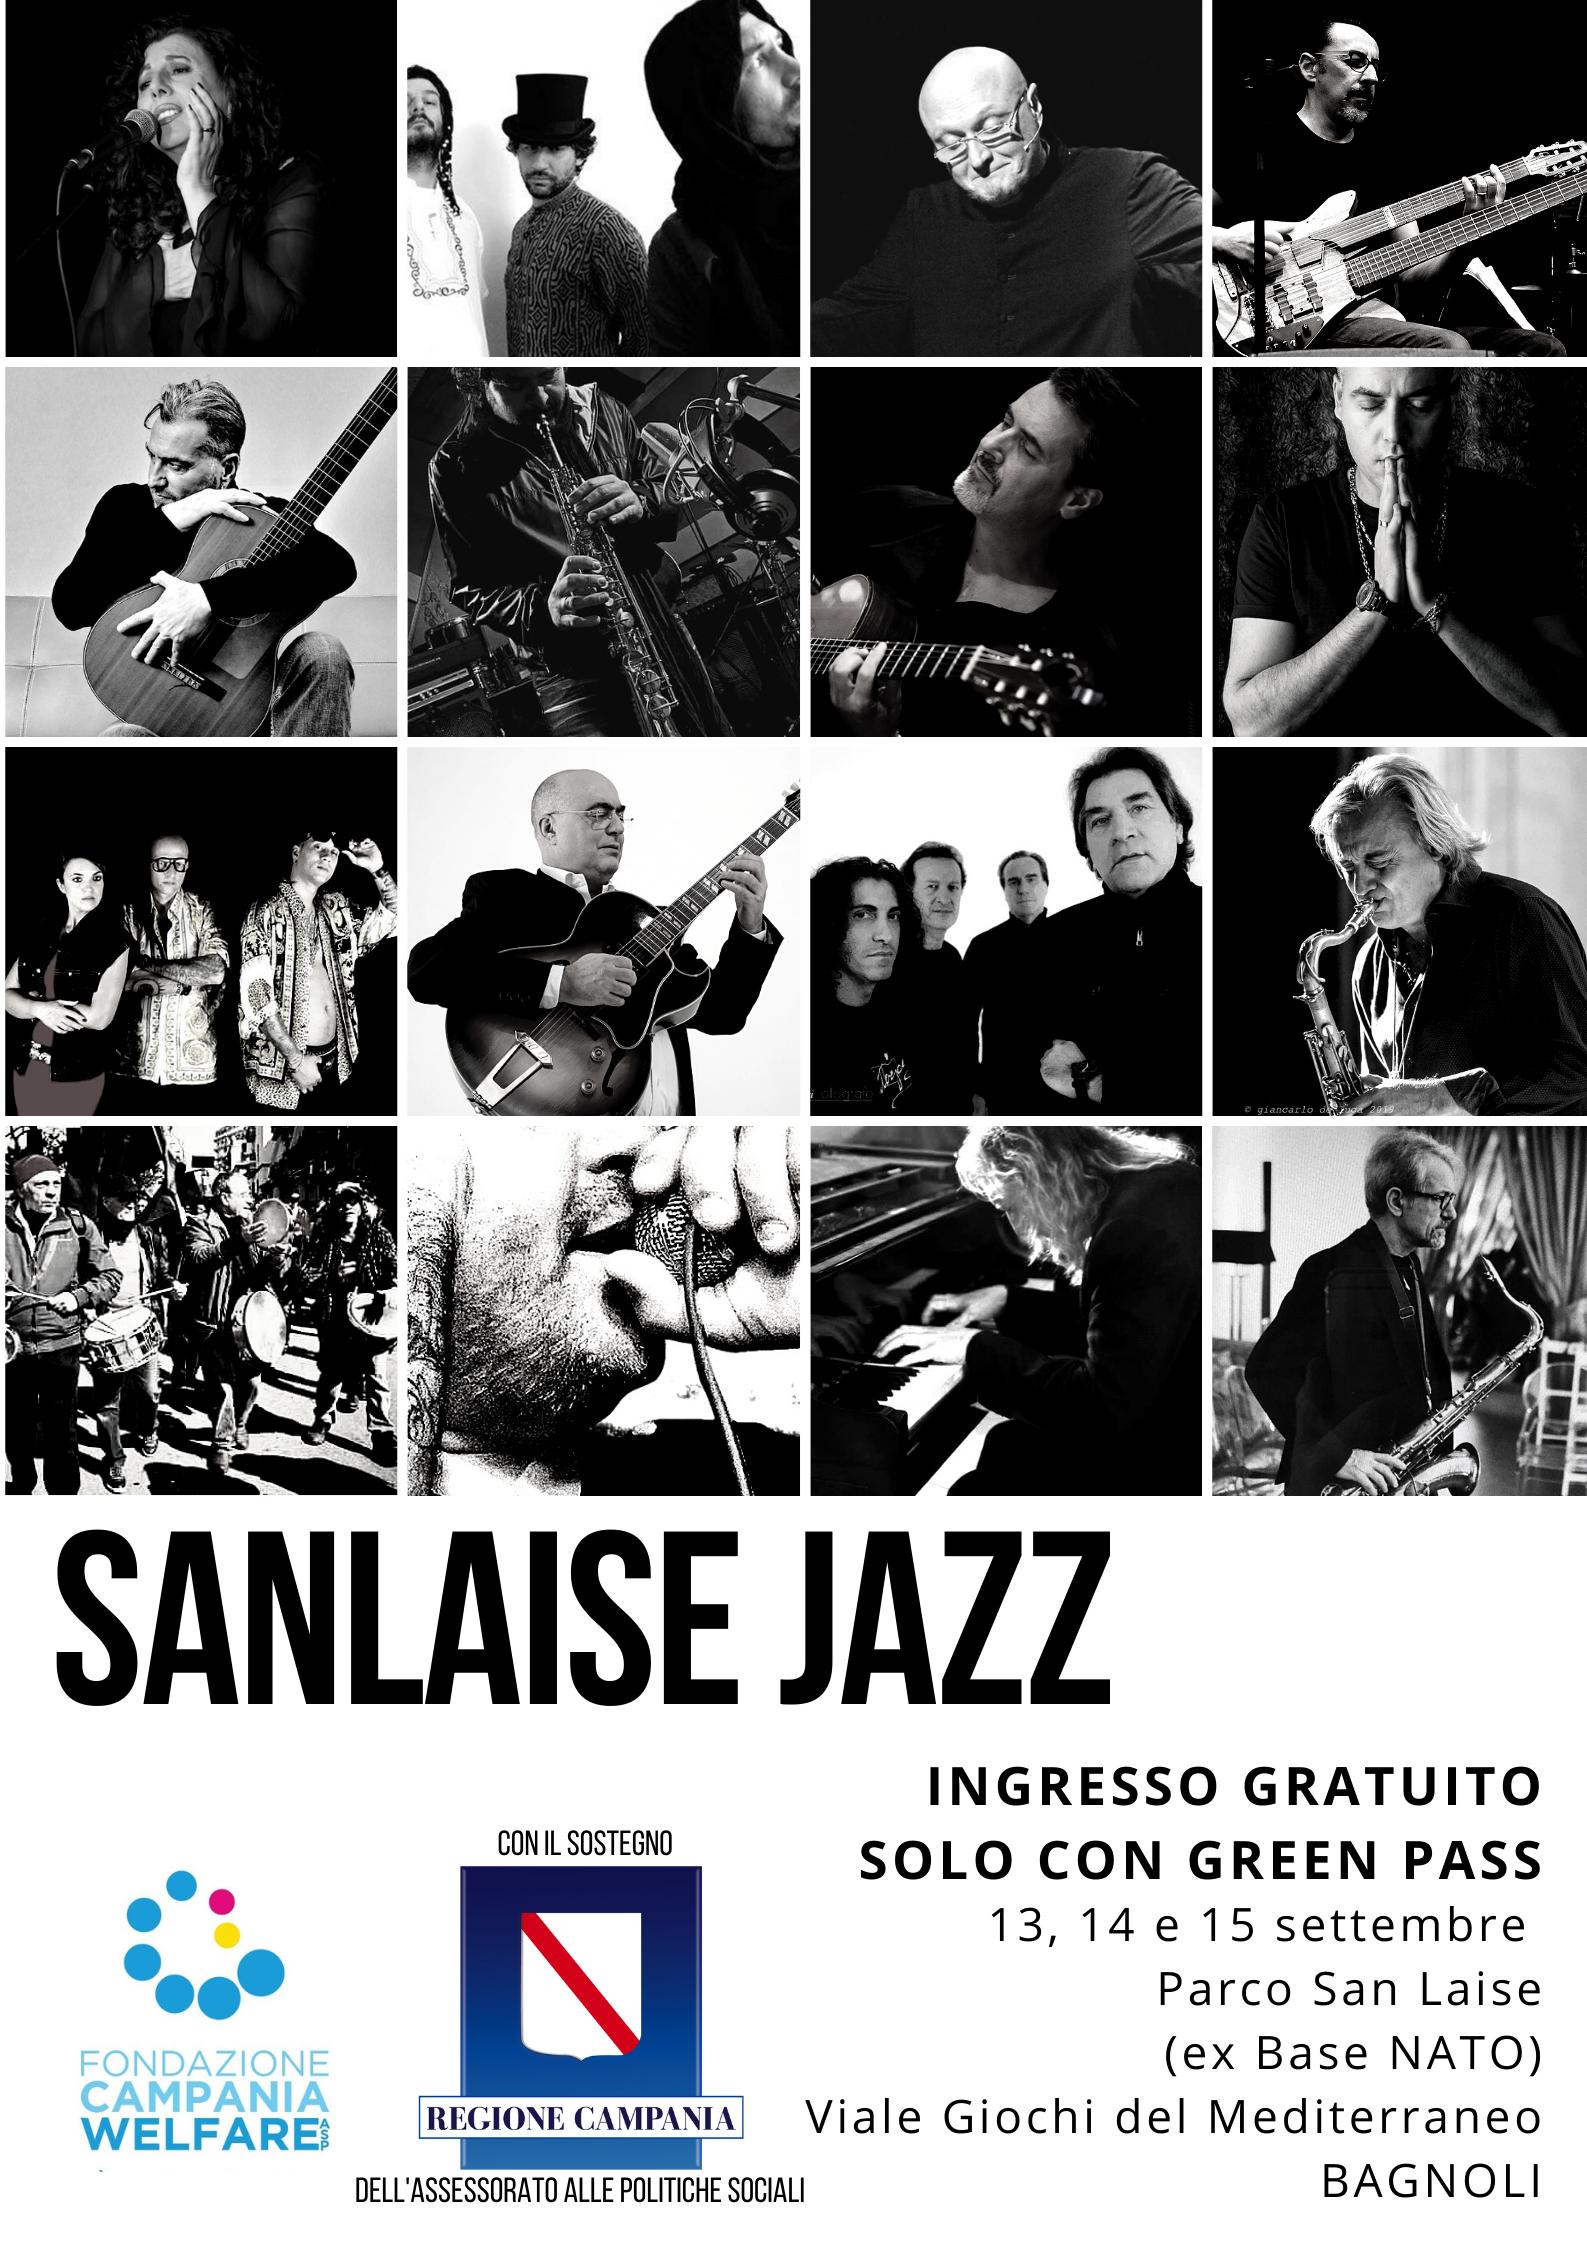 Napoli, Bagnoli: Festival San Laise Jazz 2021